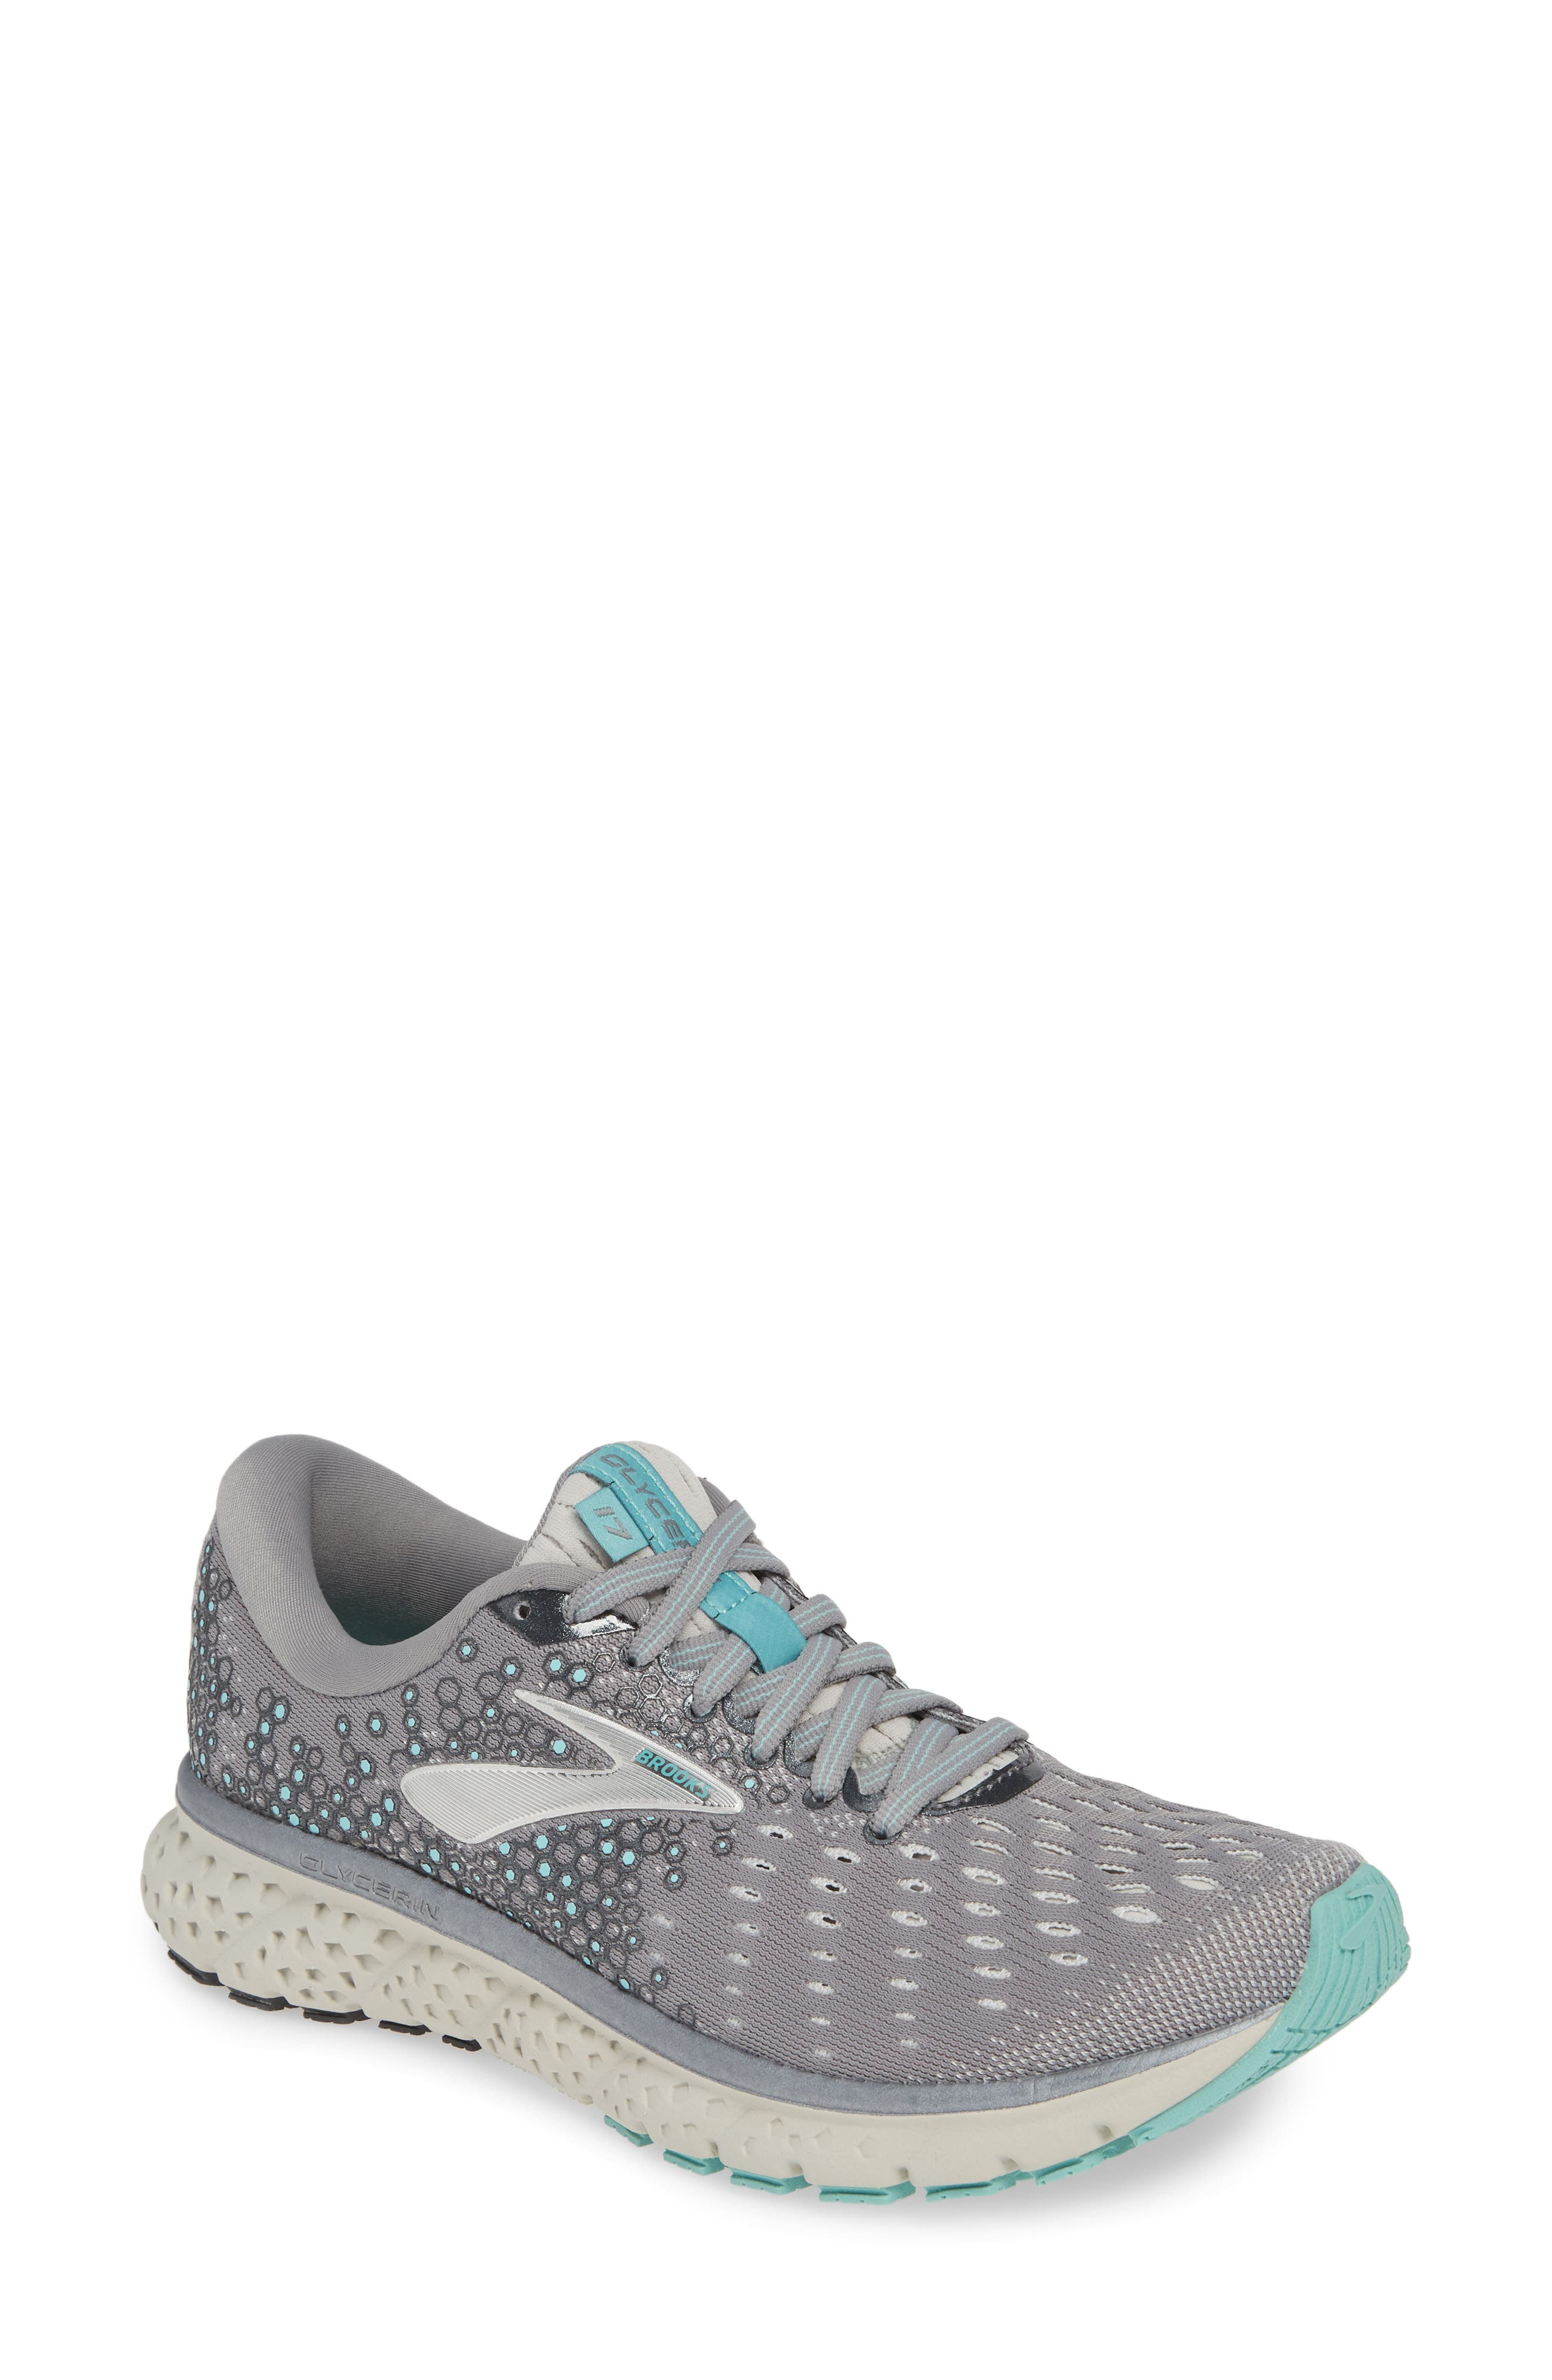 Brooks Glycerin 17 Running Shoe B - Grey